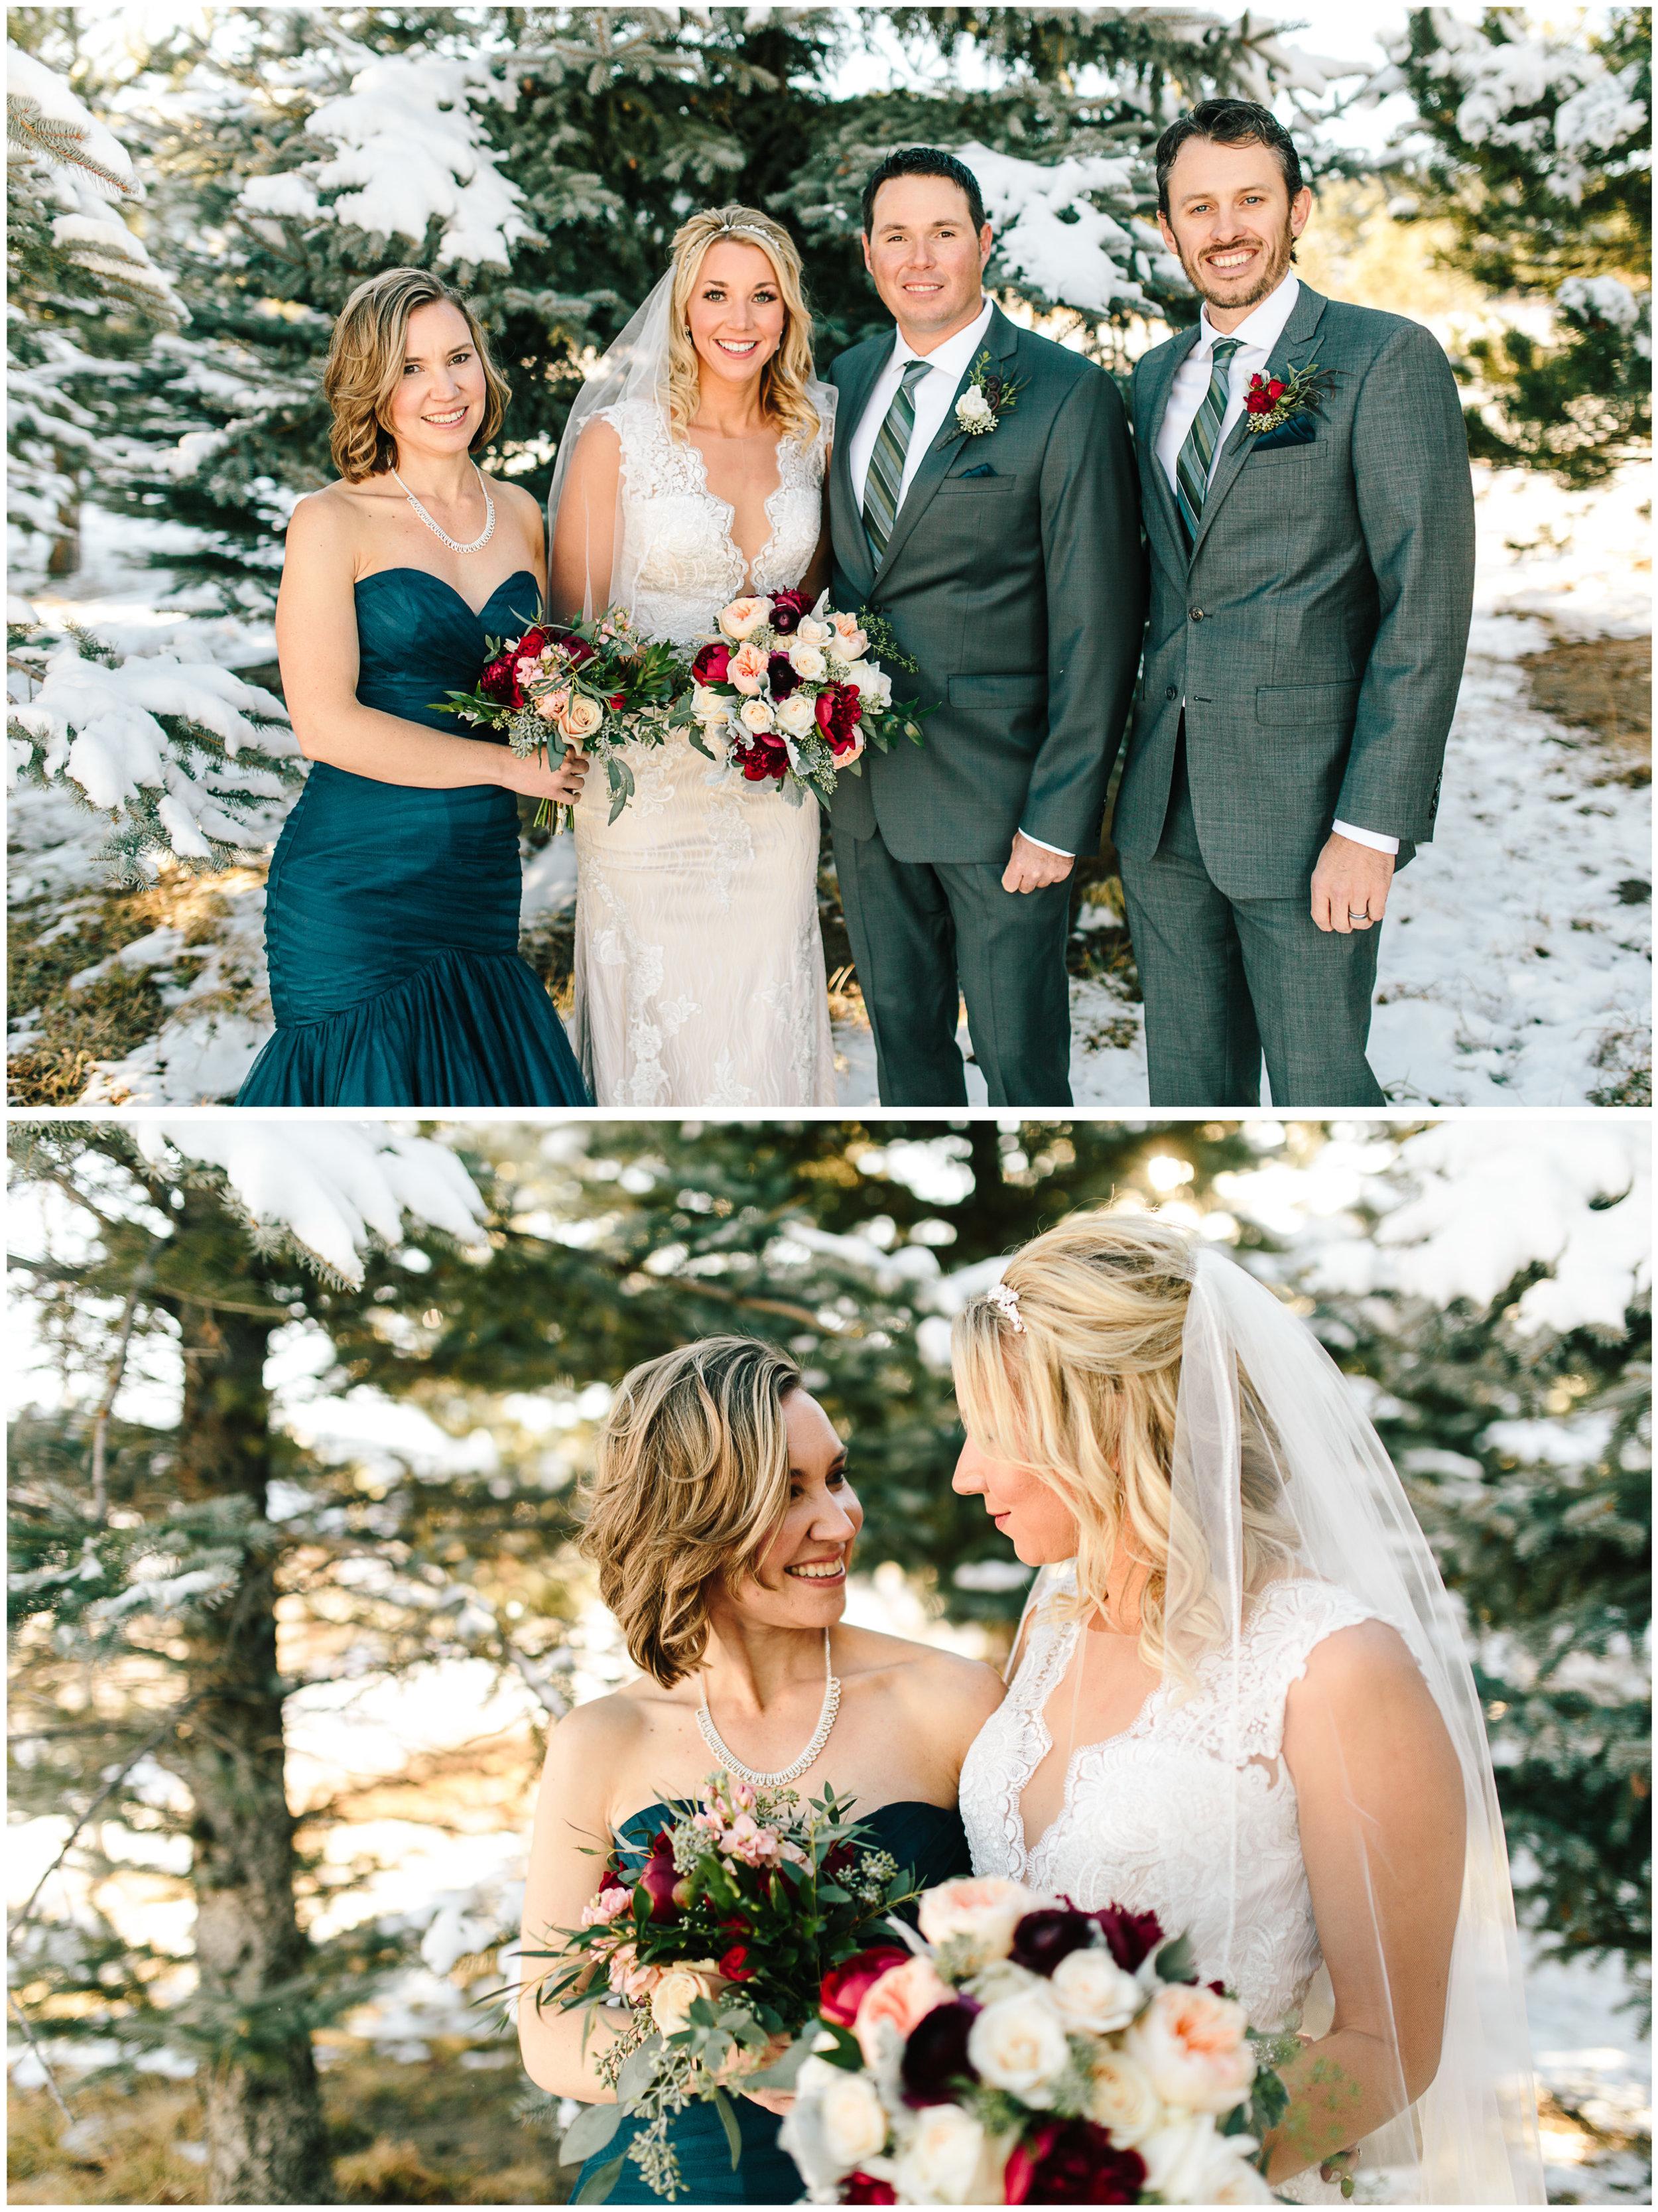 spruce_mountain_ranch_wedding_34.jpg